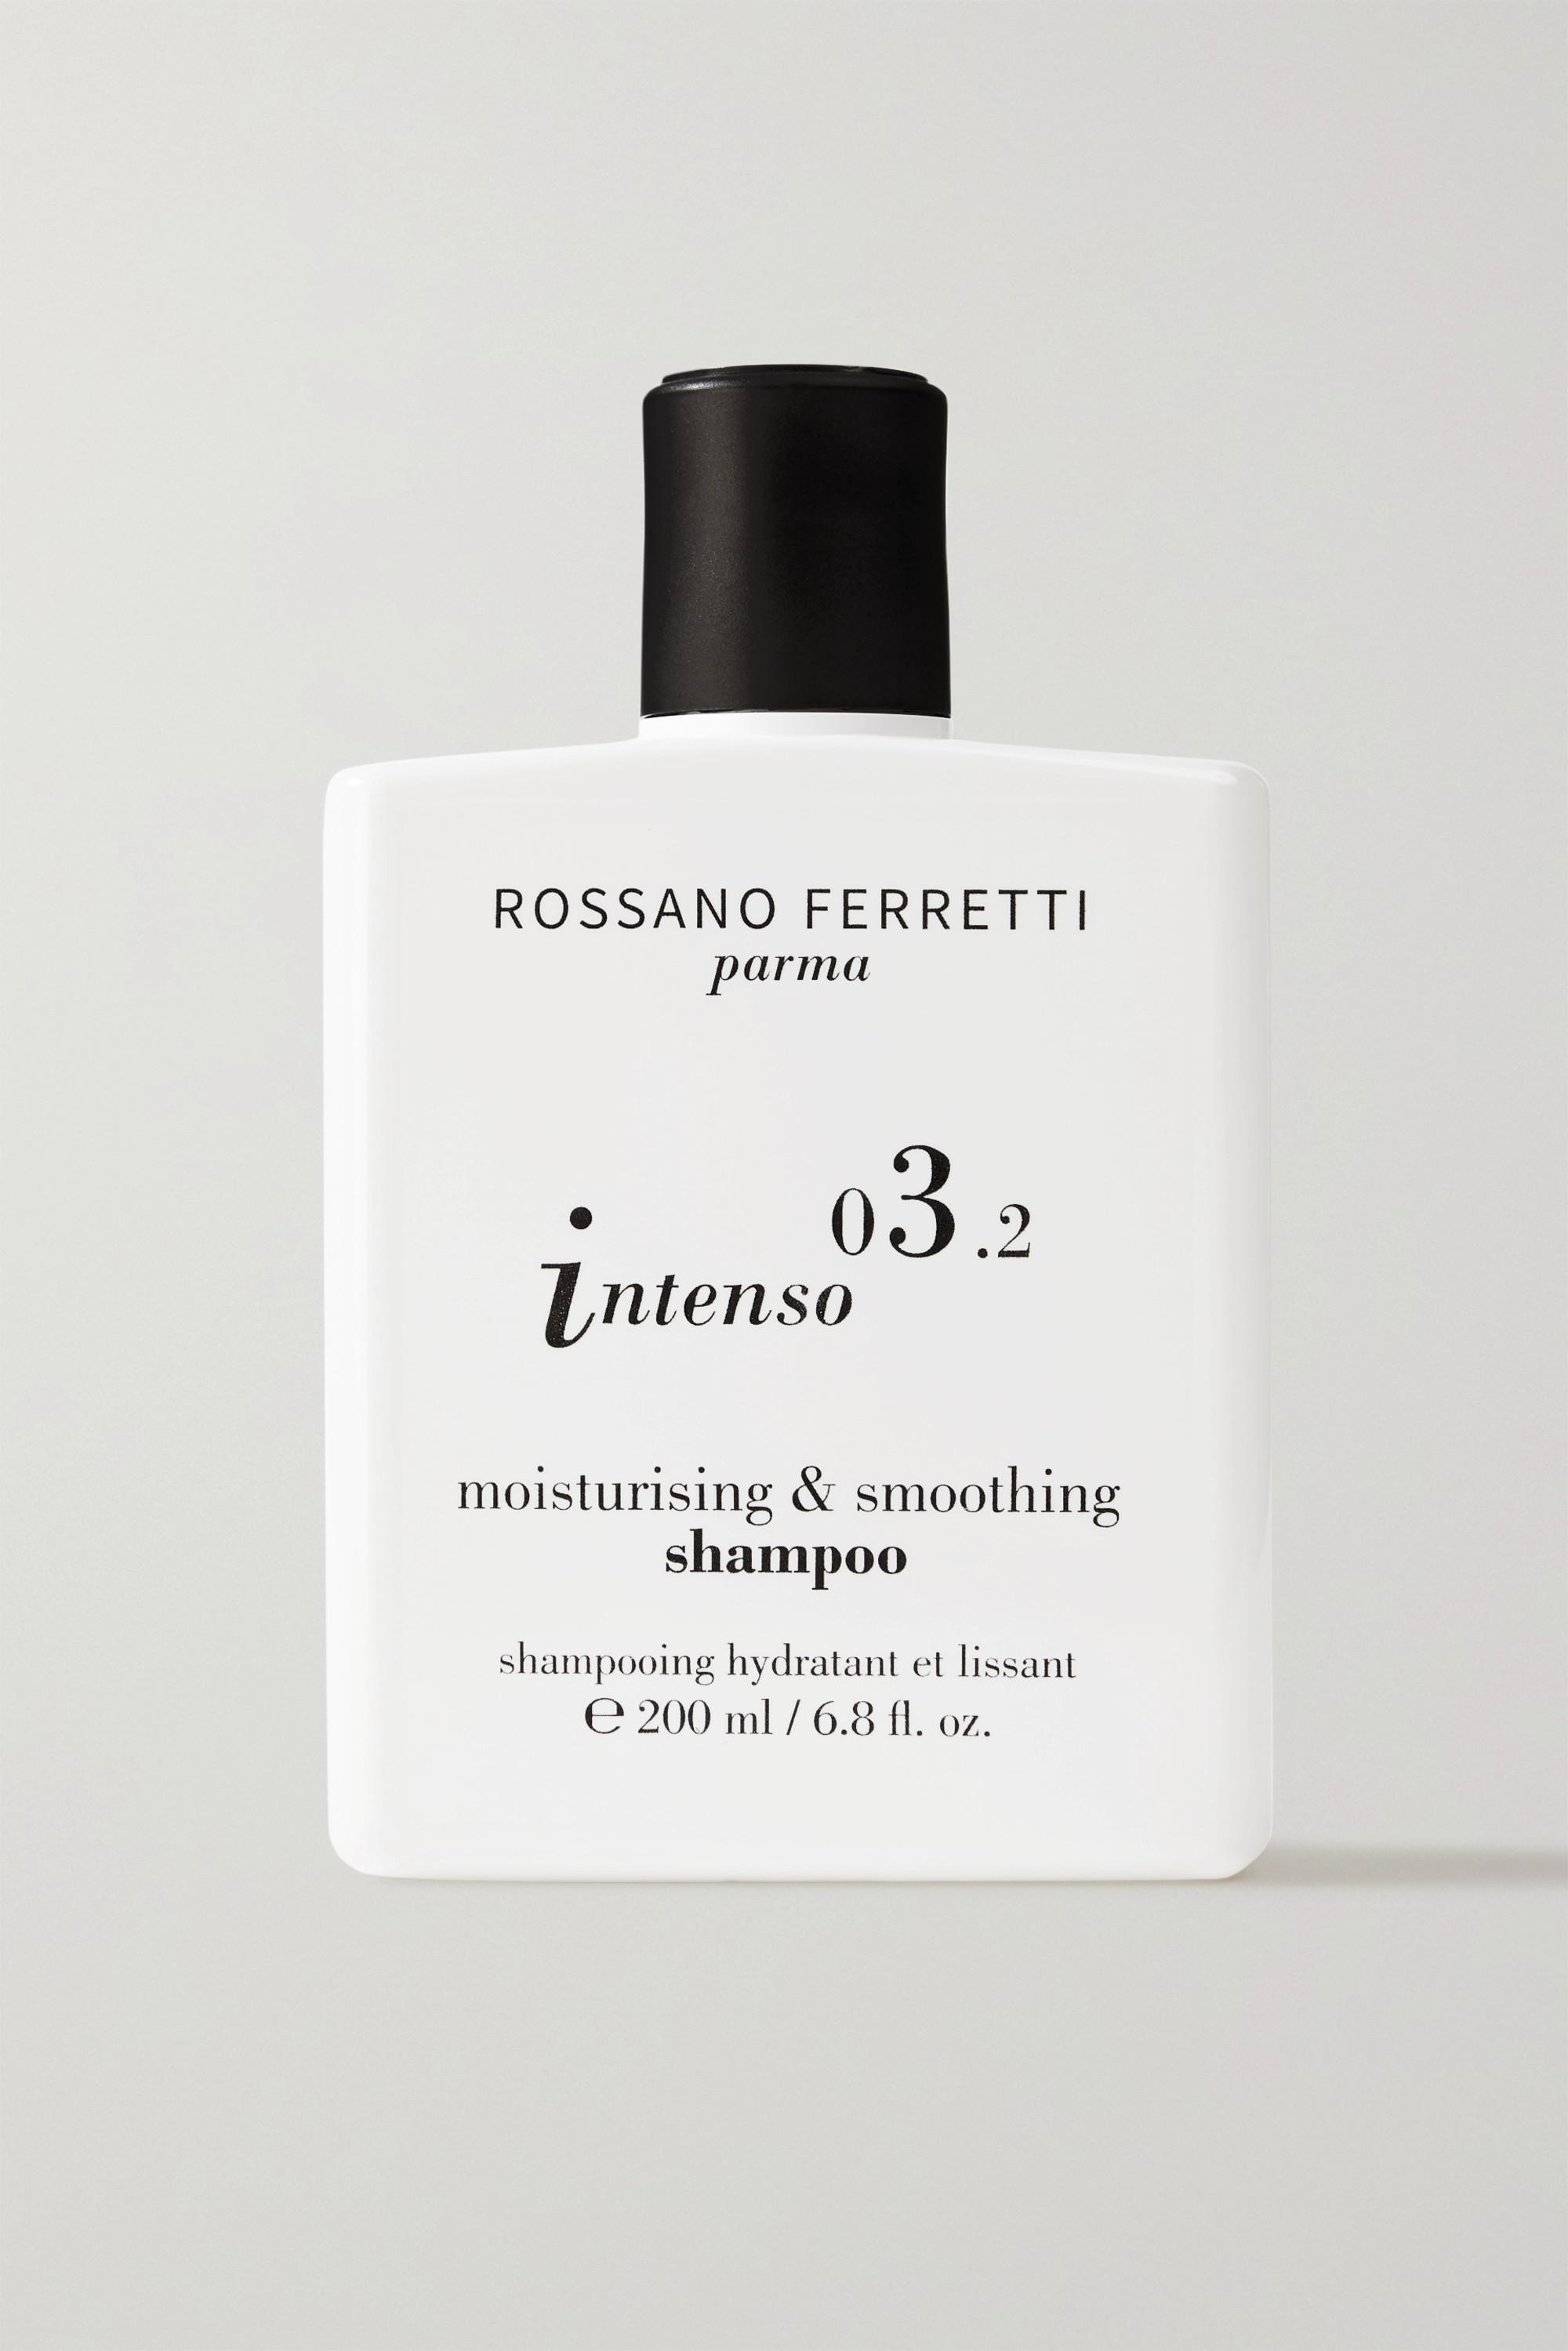 ROSSANO FERRETTI Parma Intenso Moisturizing and Smoothing Shampoo, 200 ml – Shampoo